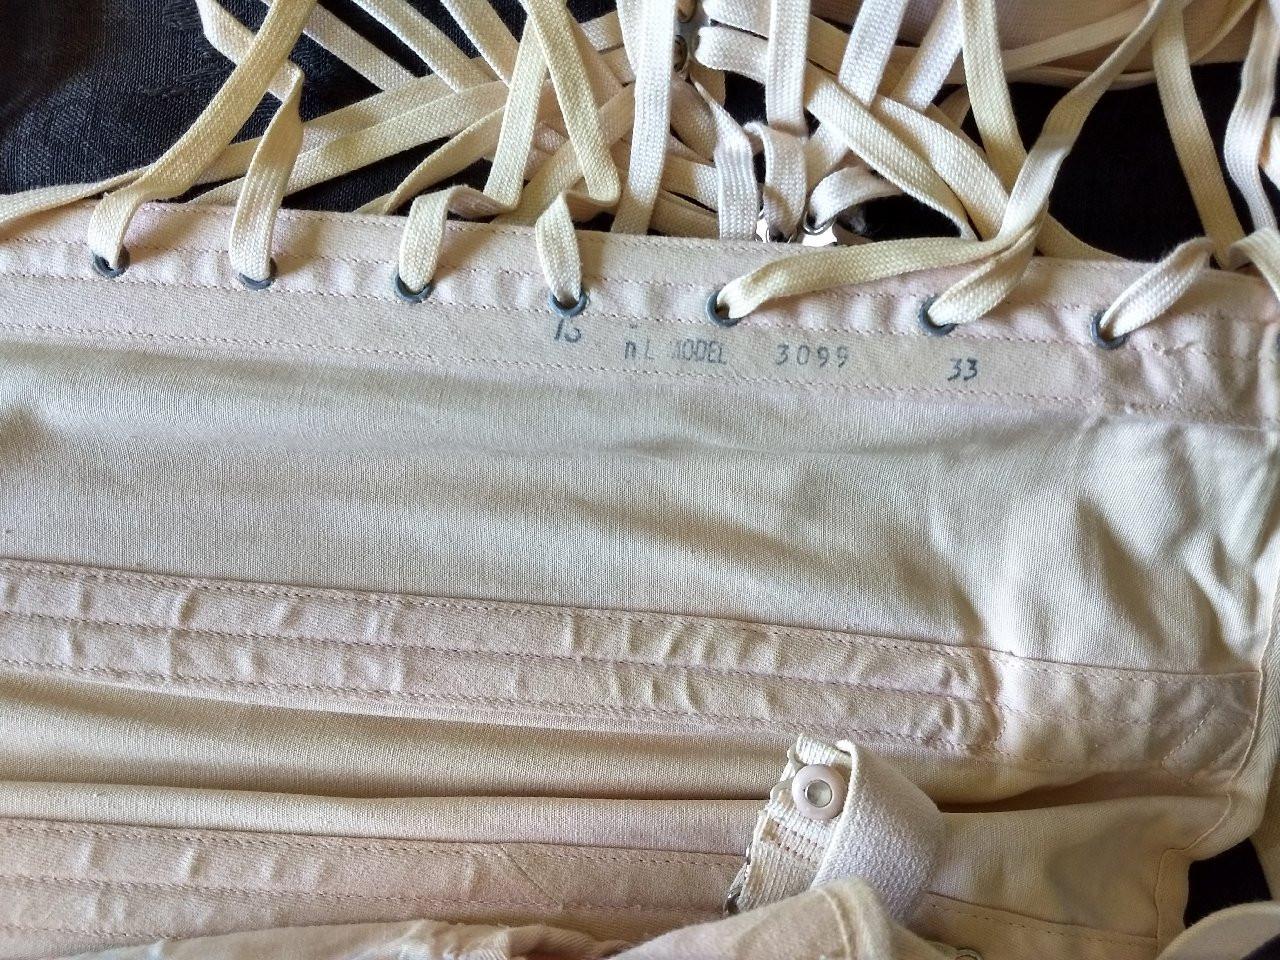 Vintage 1940 Camp Corset Under Garment Unworn Tag Box Label